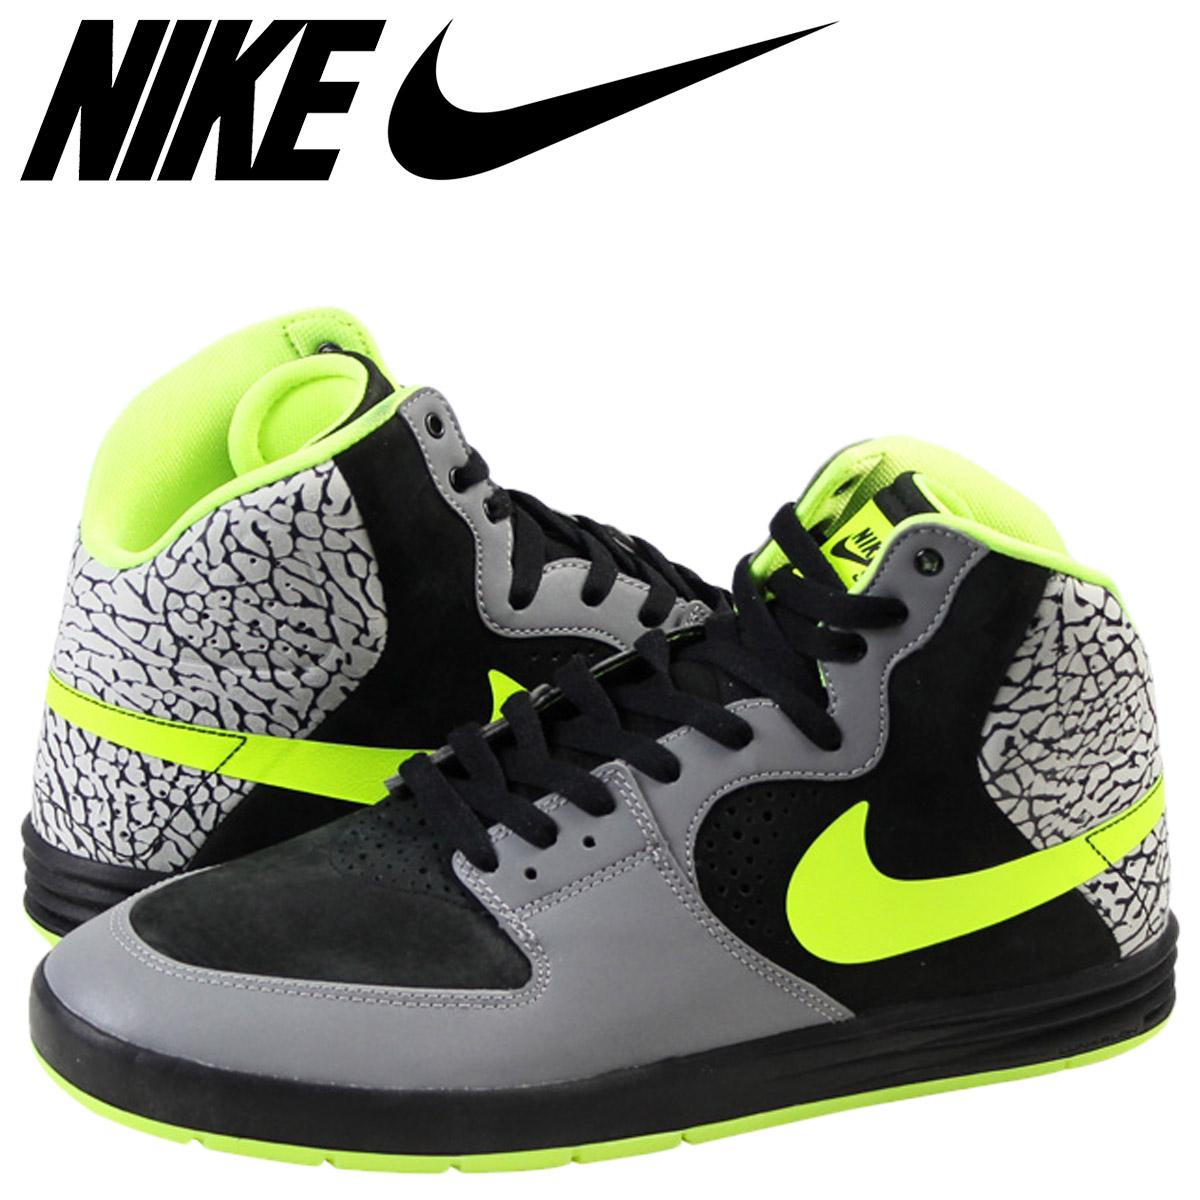 83efde5165e4 Nike NIKE Paul Rodriguez sneakers SB PAUL RODRIGUEZ 7 HI PREMIUM QS DJ  CLARK KENT Paul Rodriguez 629183-030 grey mens